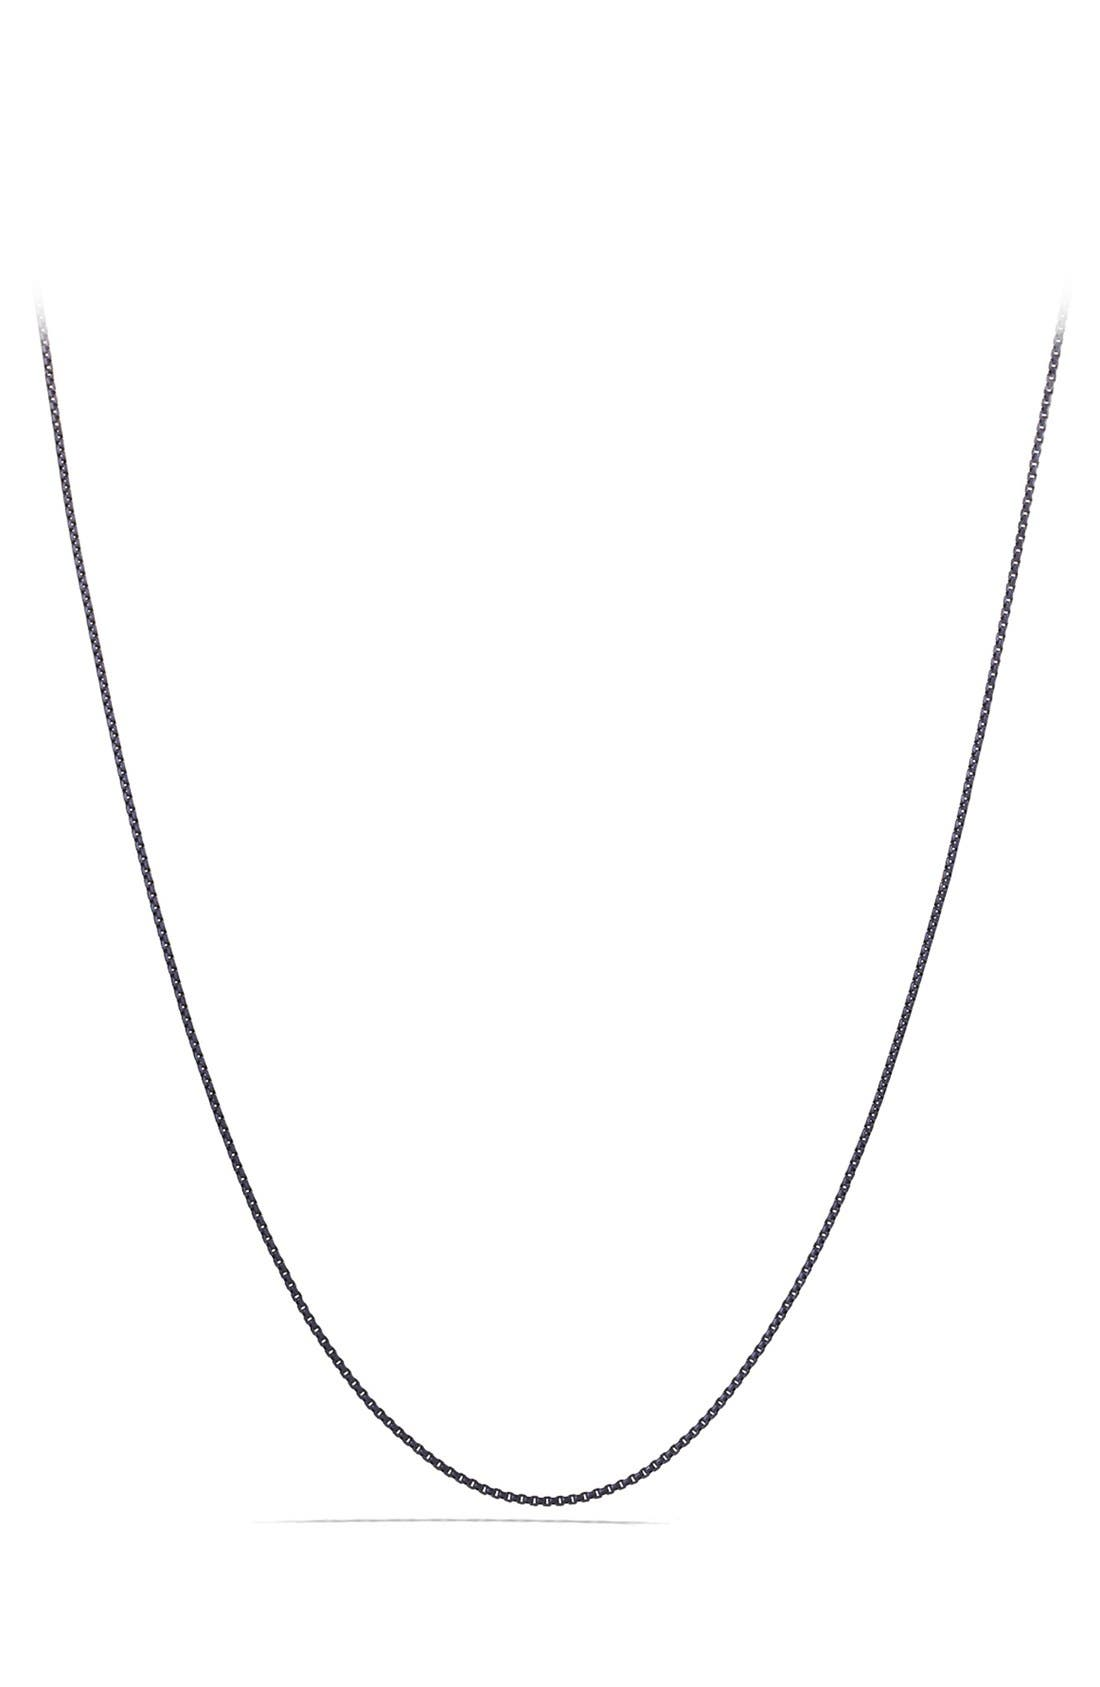 'Chain' Box Chain Necklace,                             Main thumbnail 1, color,                             Silver